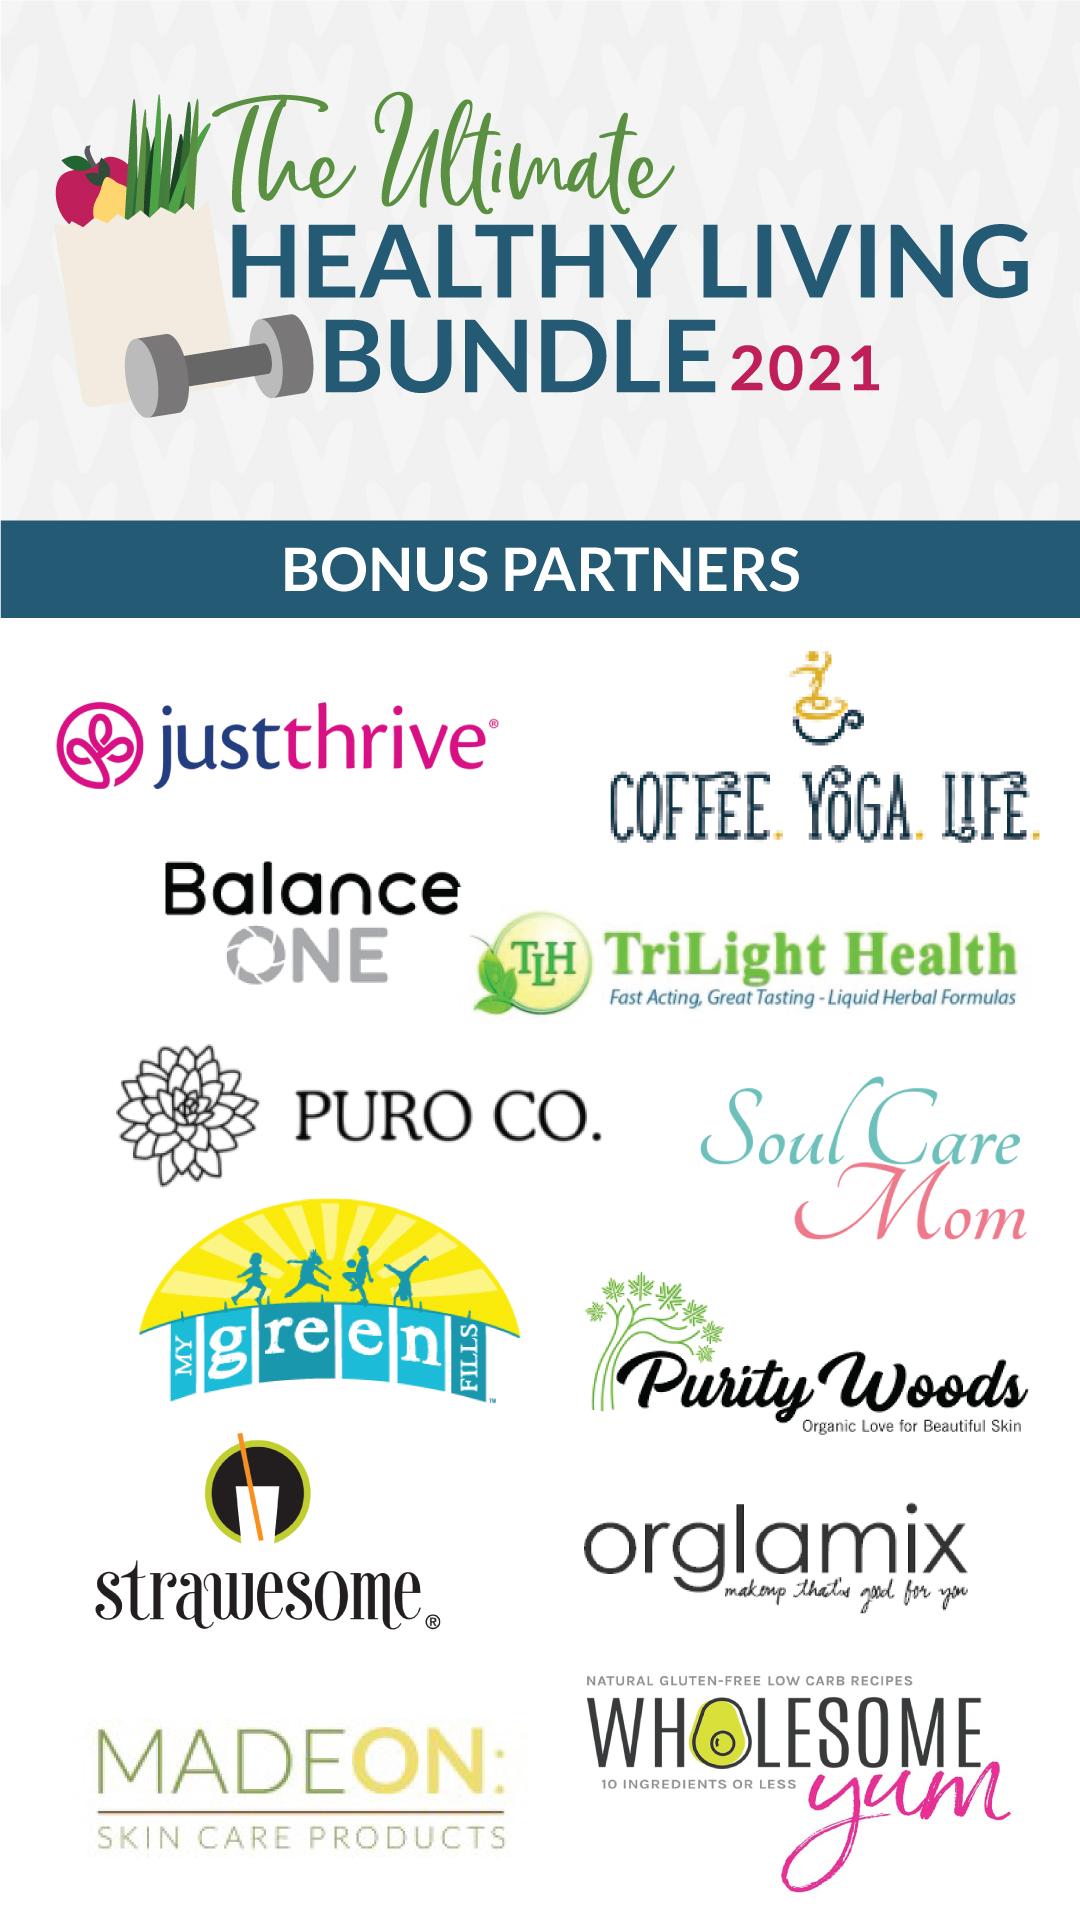 Ultimate Healthy Living Bundle 2021